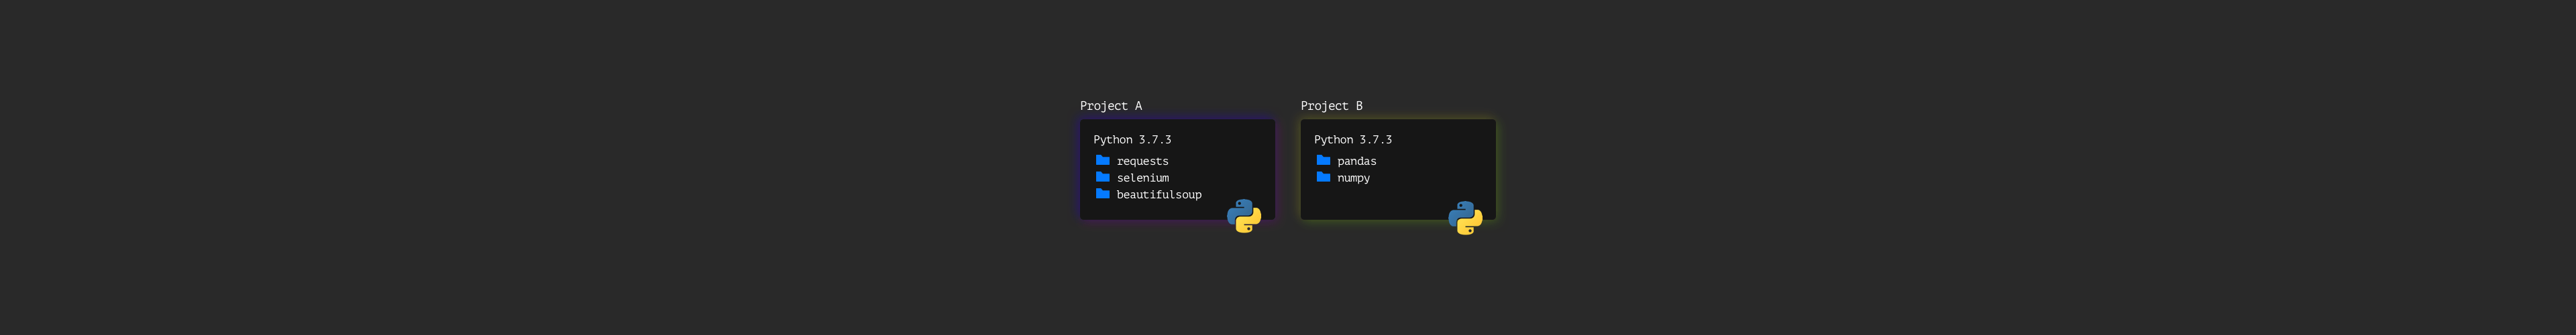 Image for Python Virtual Environments with Virtualenv